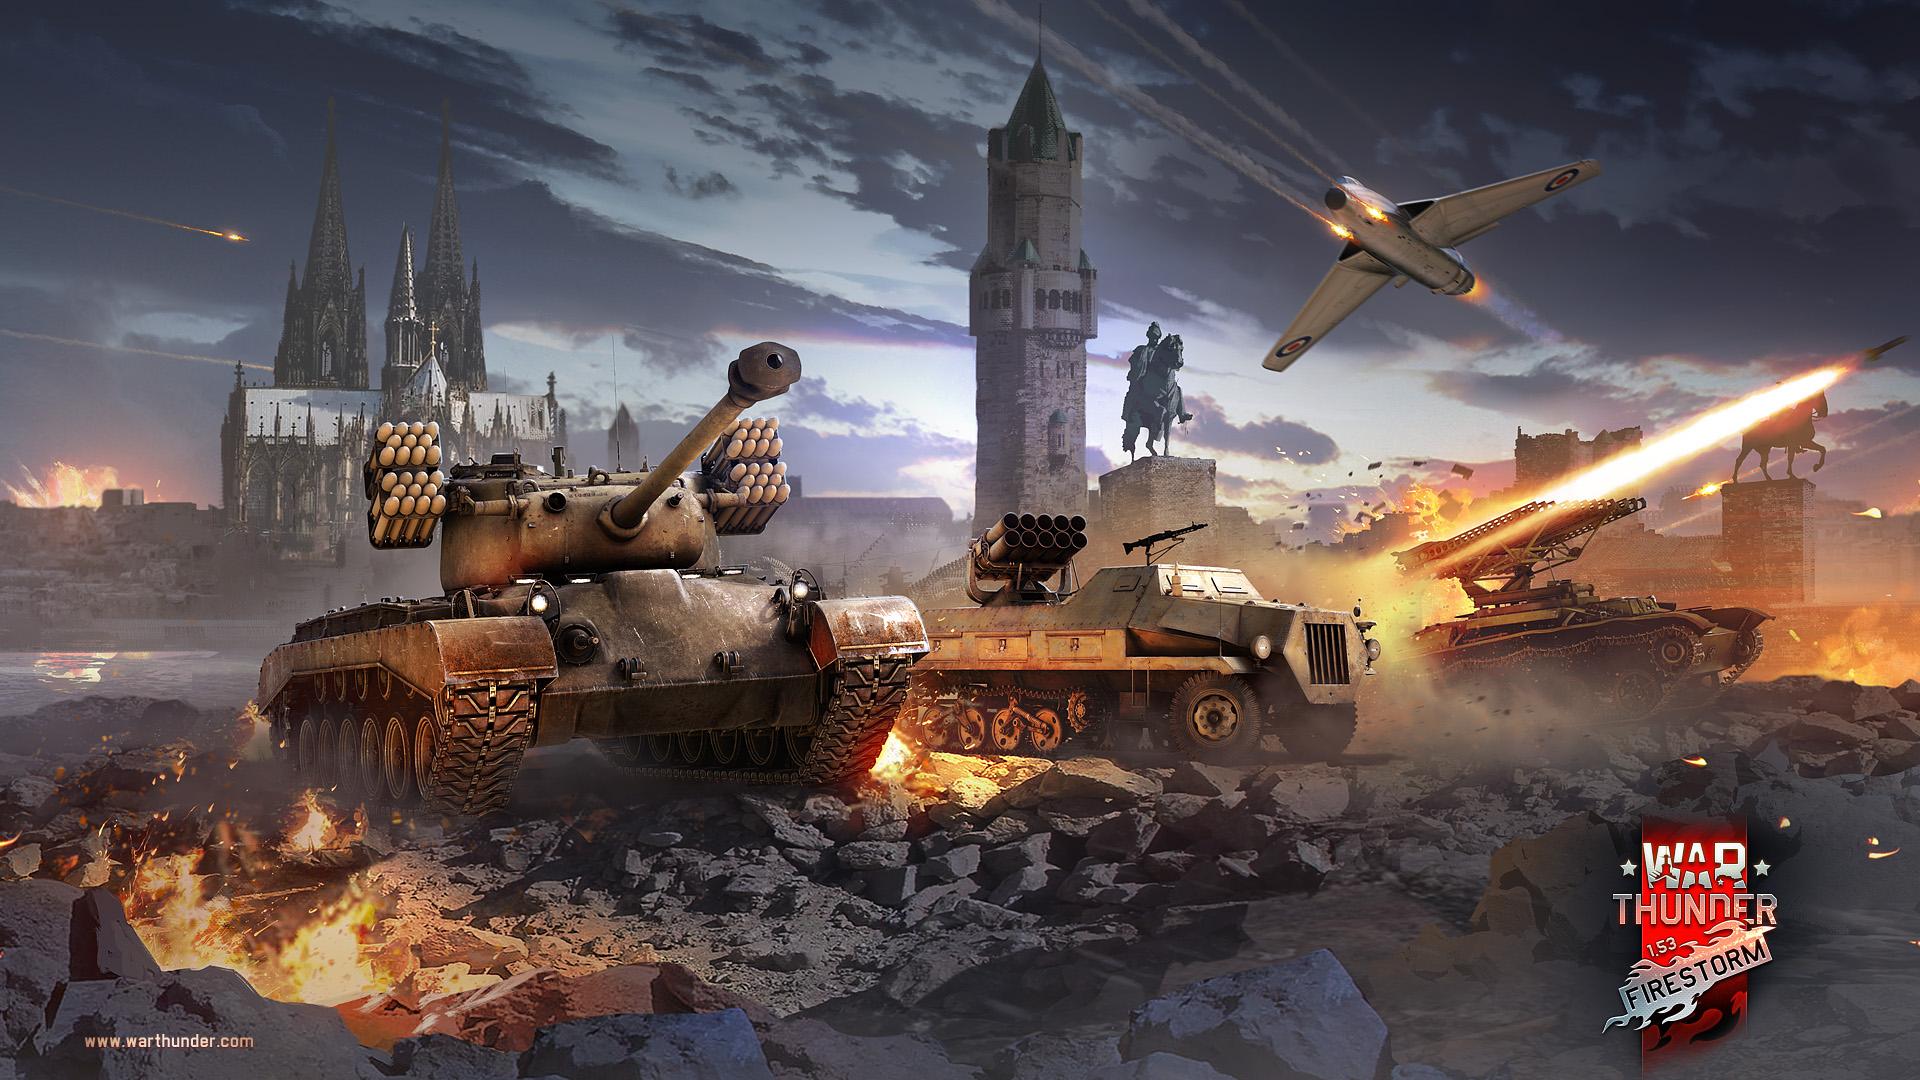 WarThunder_1_53_Firestorm